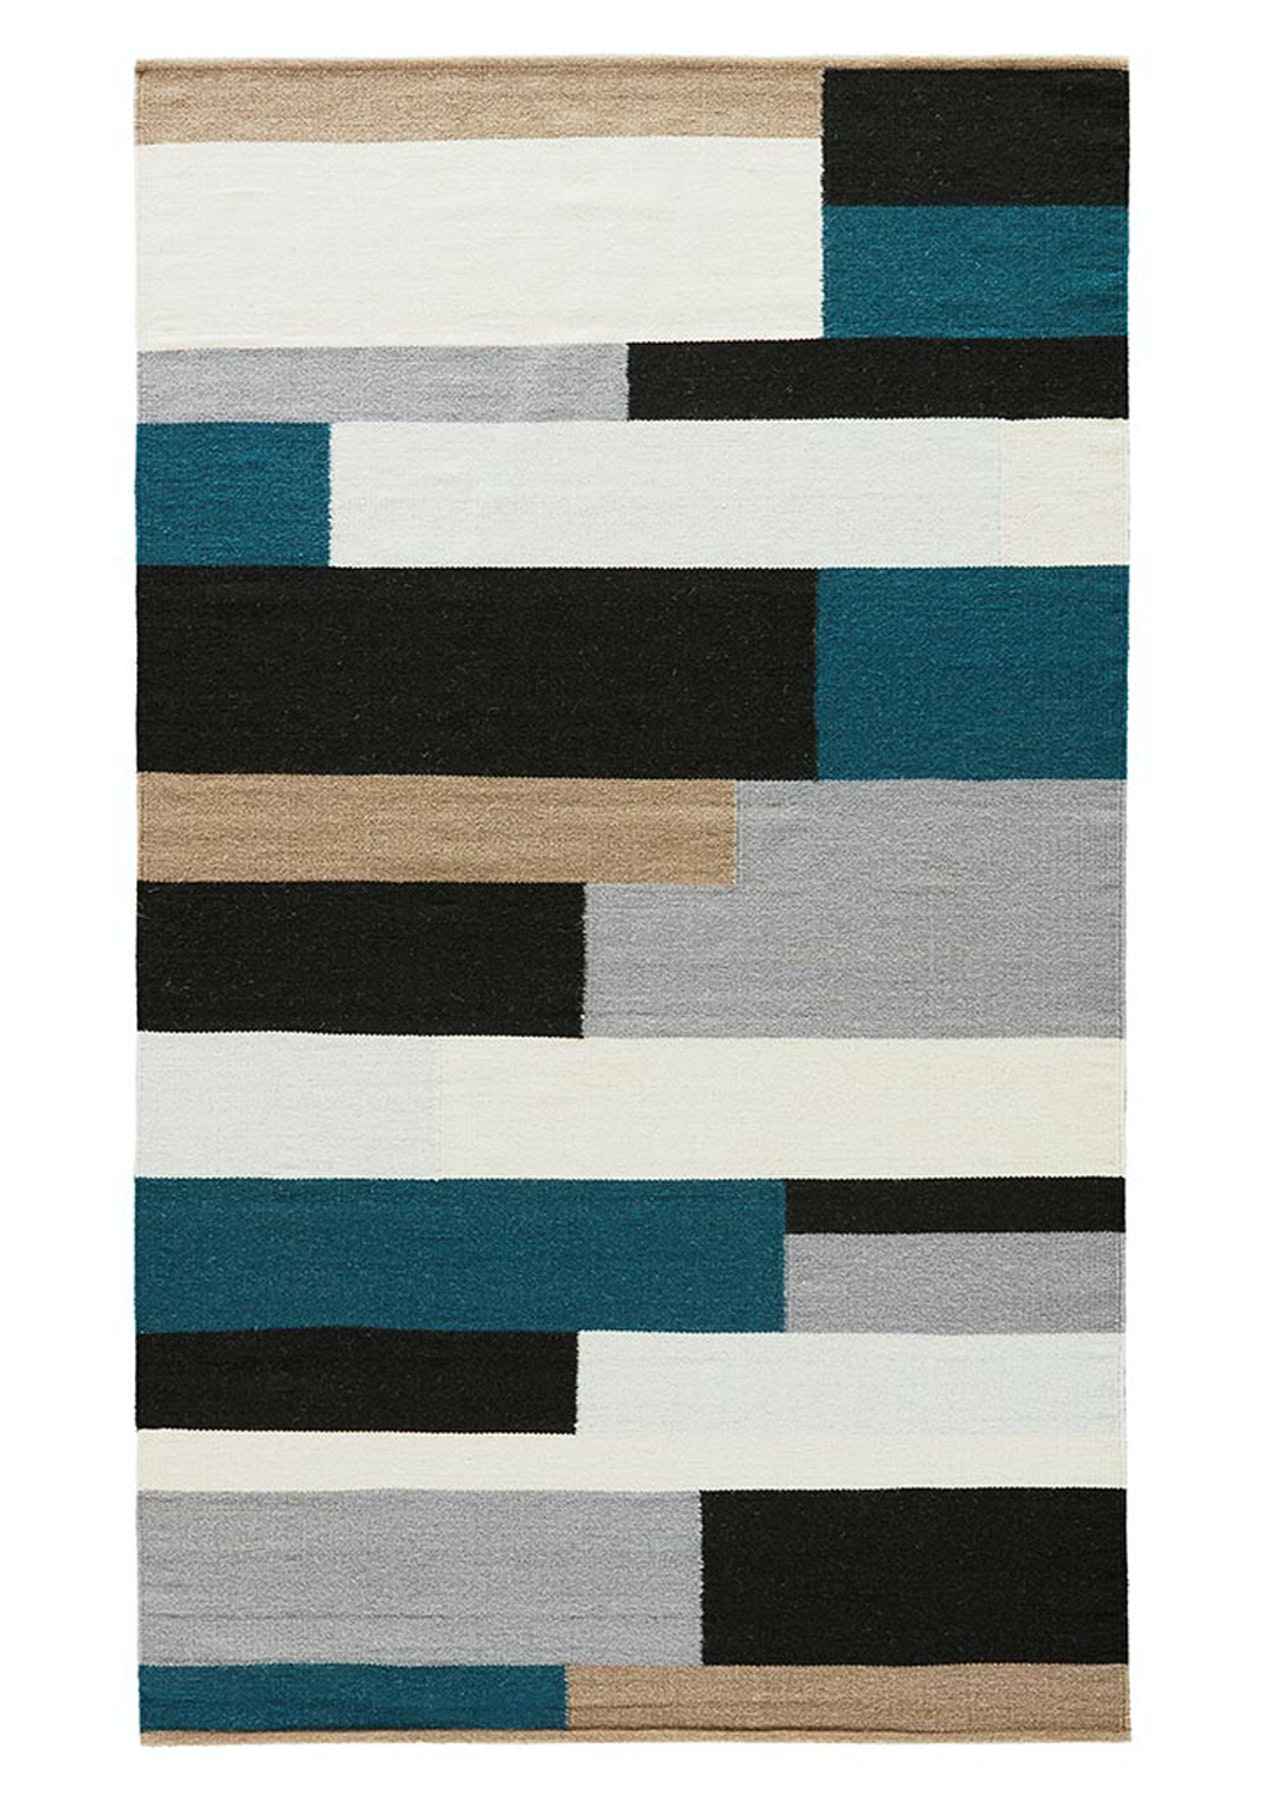 Wool Cotton Rug Teal Black Multi 160 X 230cm Free Shipping